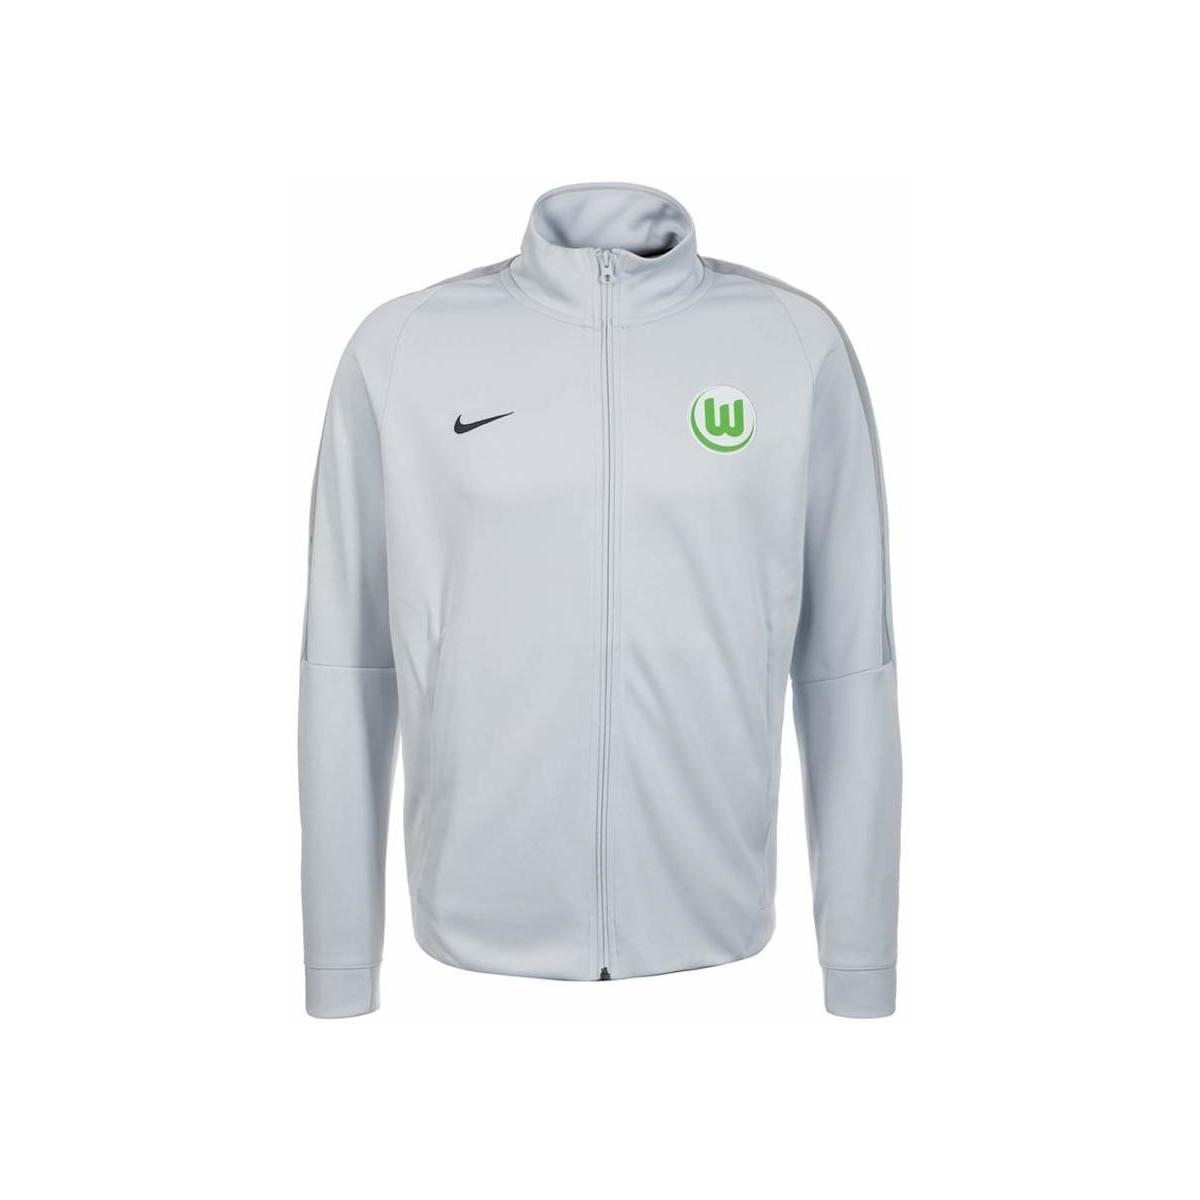 2016 2017 VFL Wolfsburg Nike Rain Jacket (Navy)